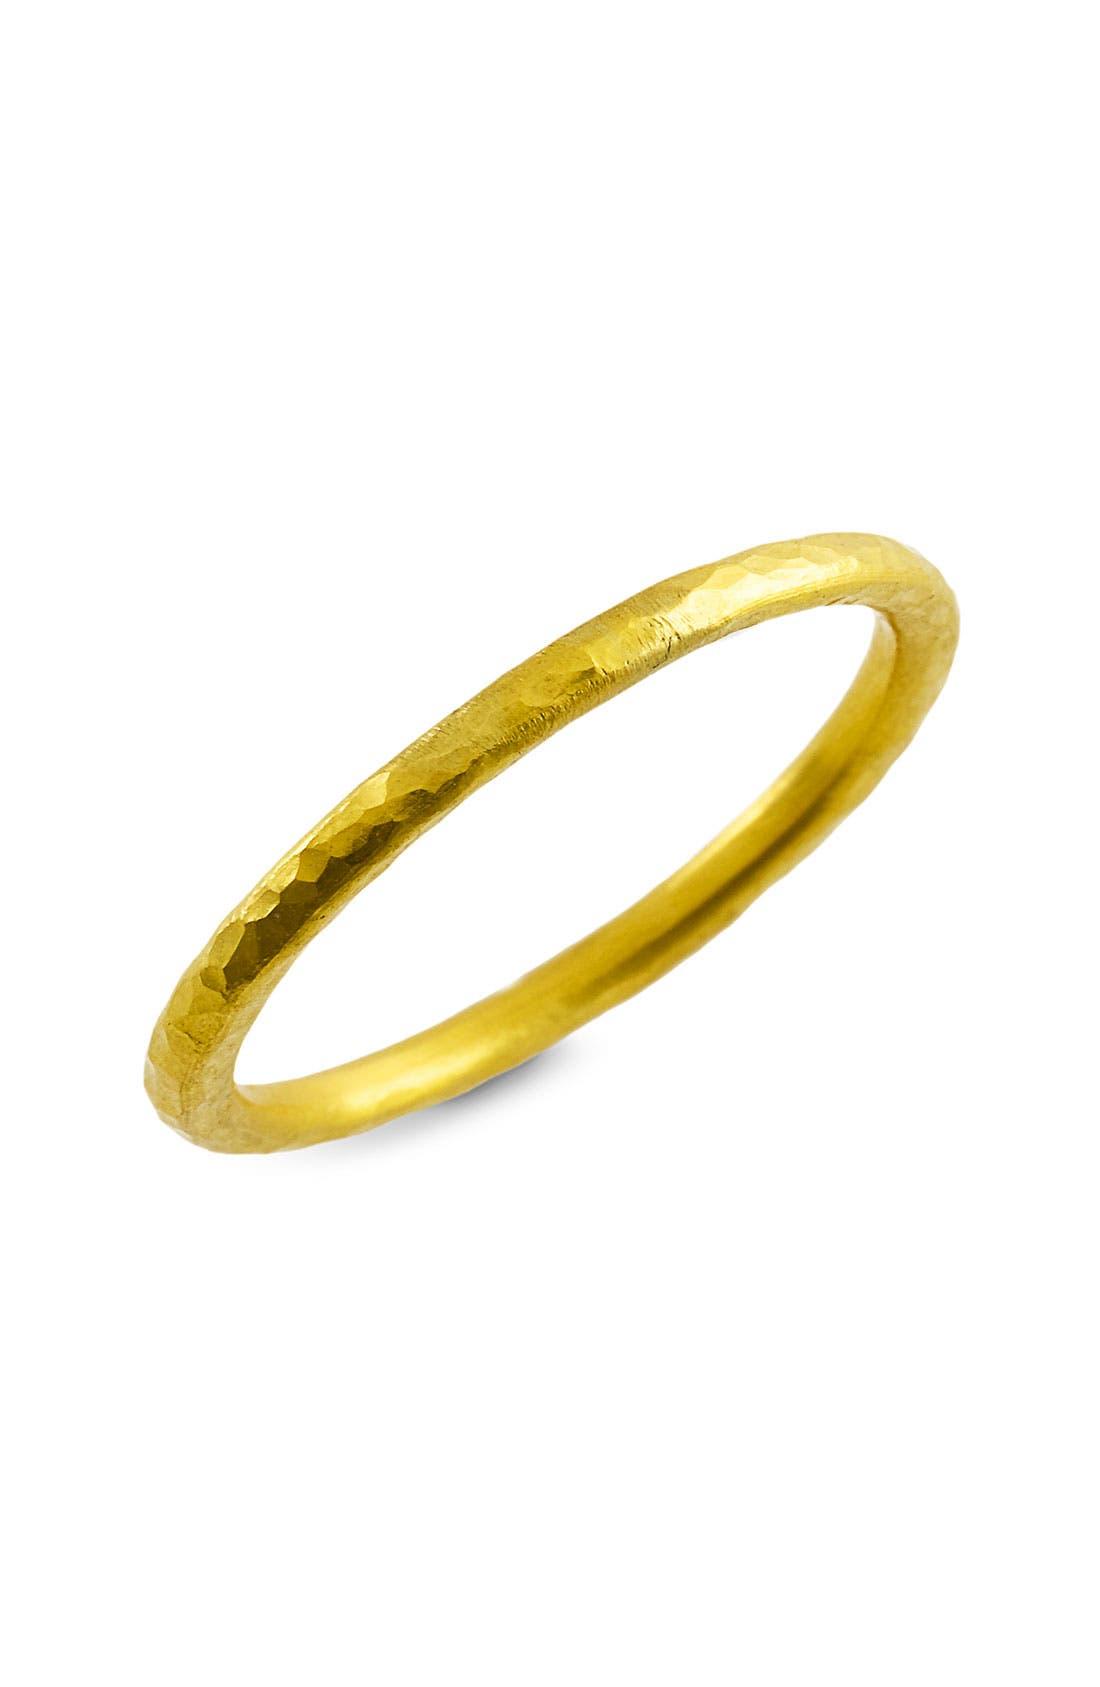 Alternate Image 1 Selected - Gurhan Slender Gold Ring